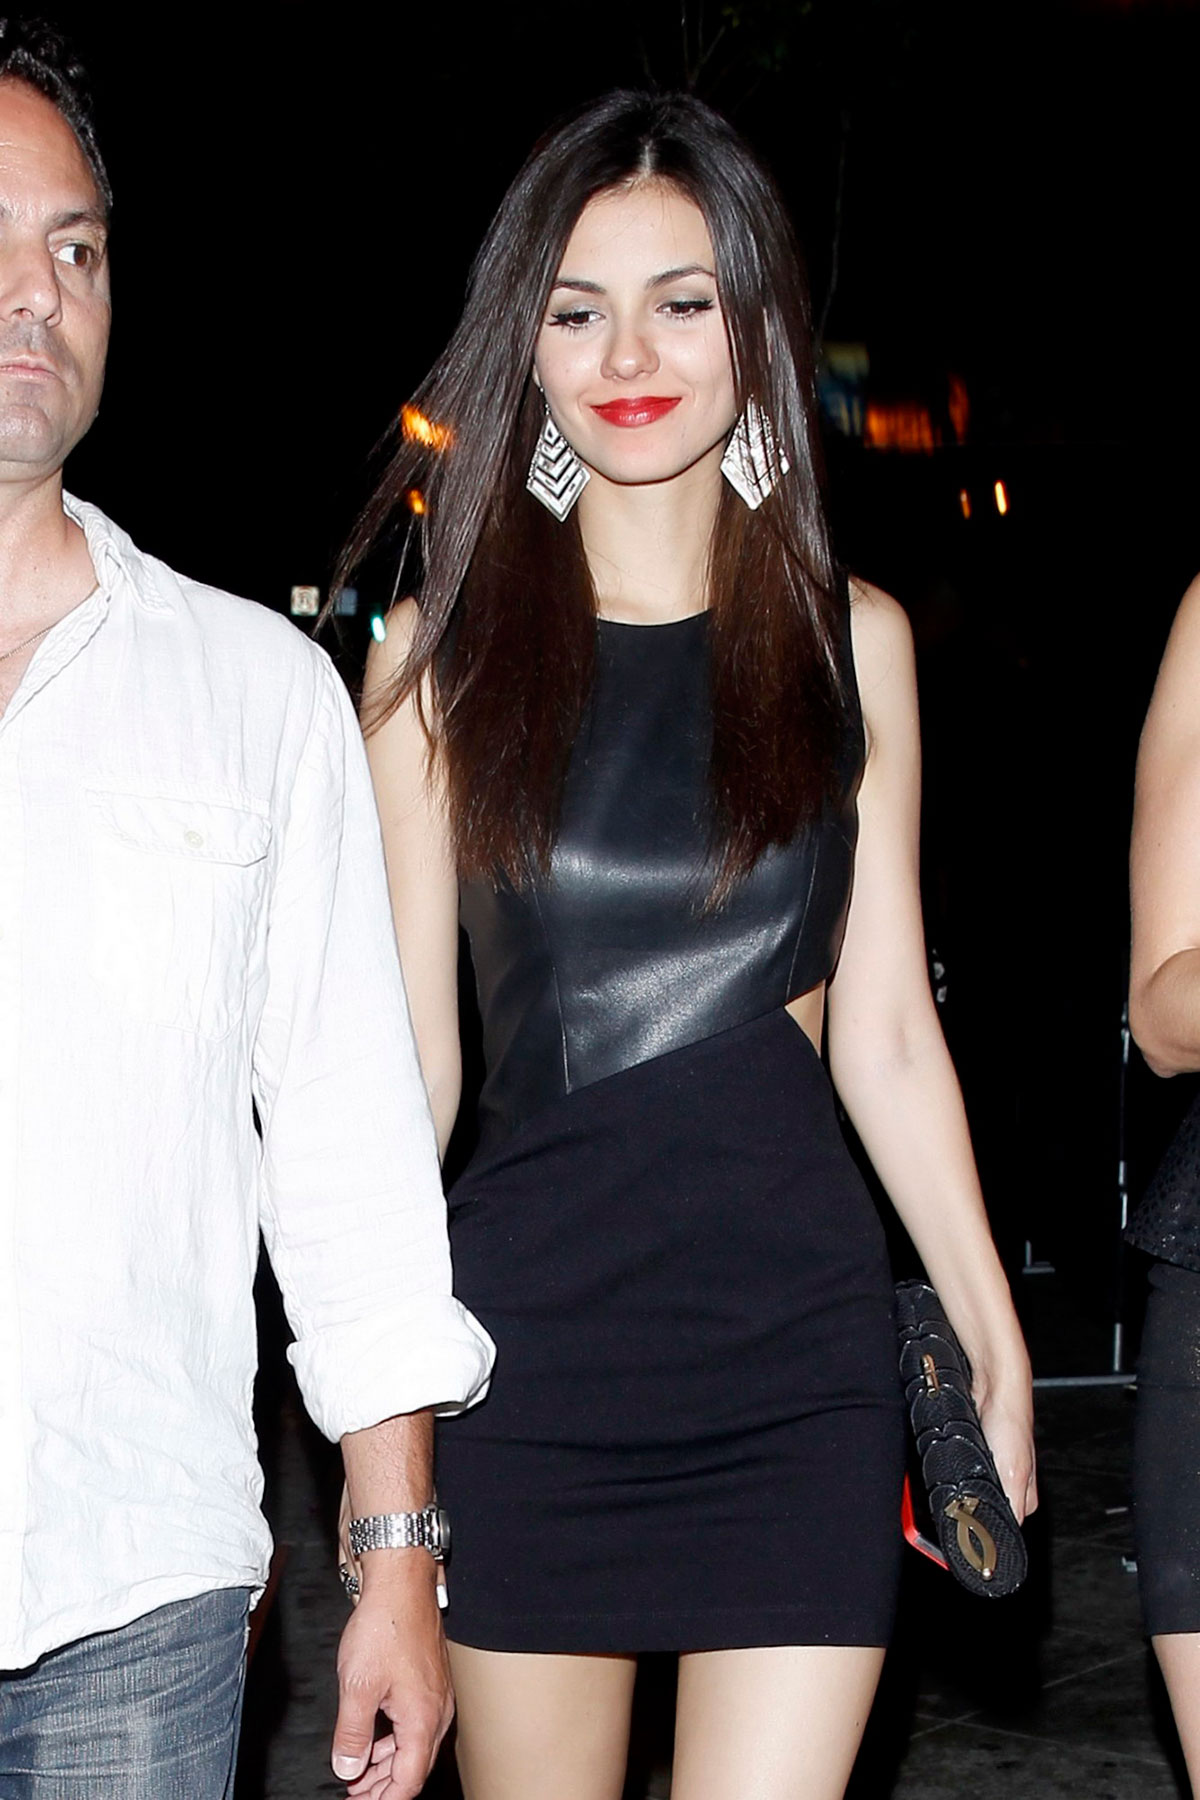 Victoria Justice at 1OAK Nightclub West Hollywood